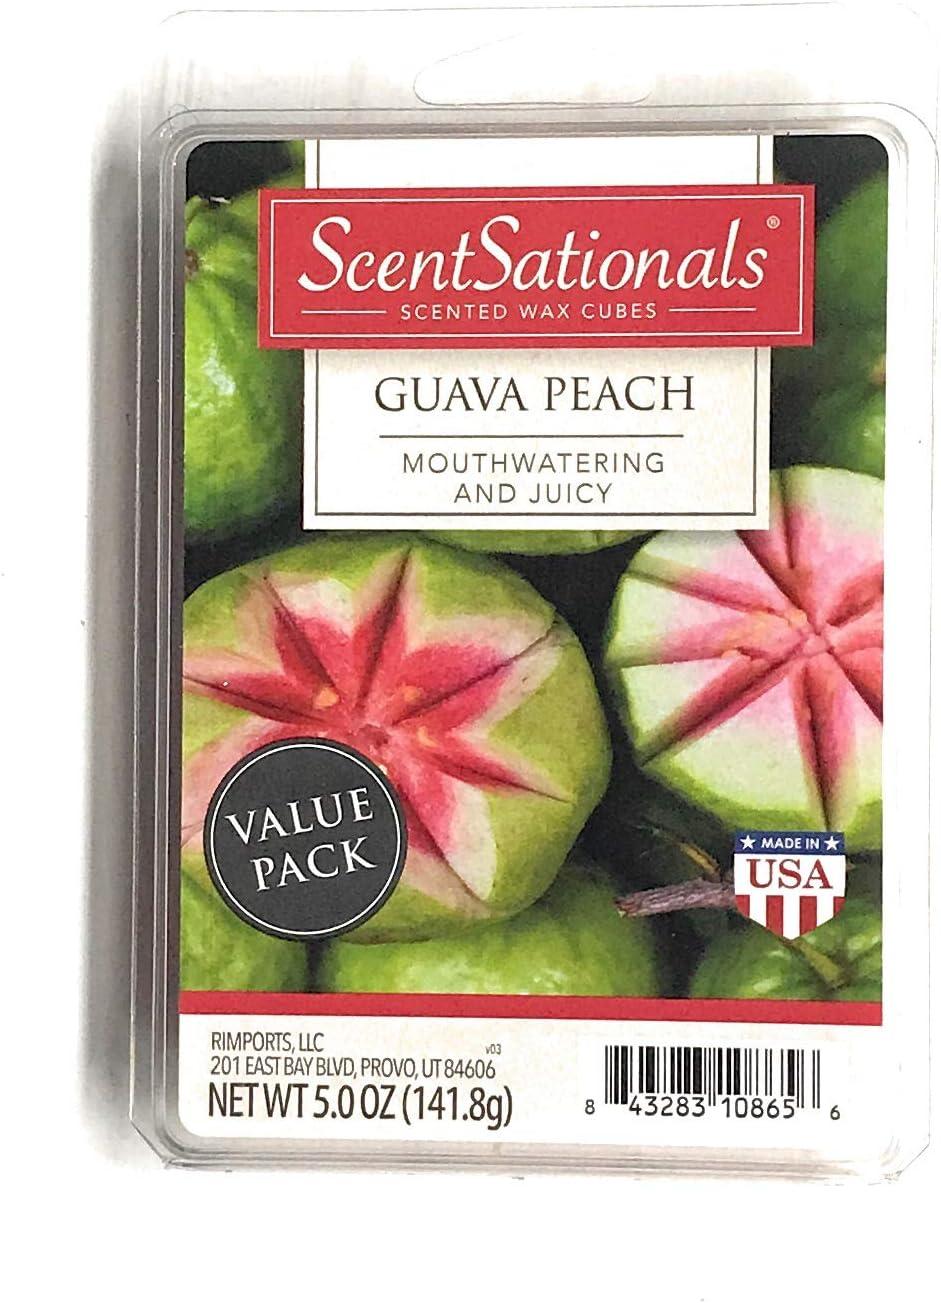 Scentsationals Scented Wax Cubes (5.0 oz, Guava Peach)